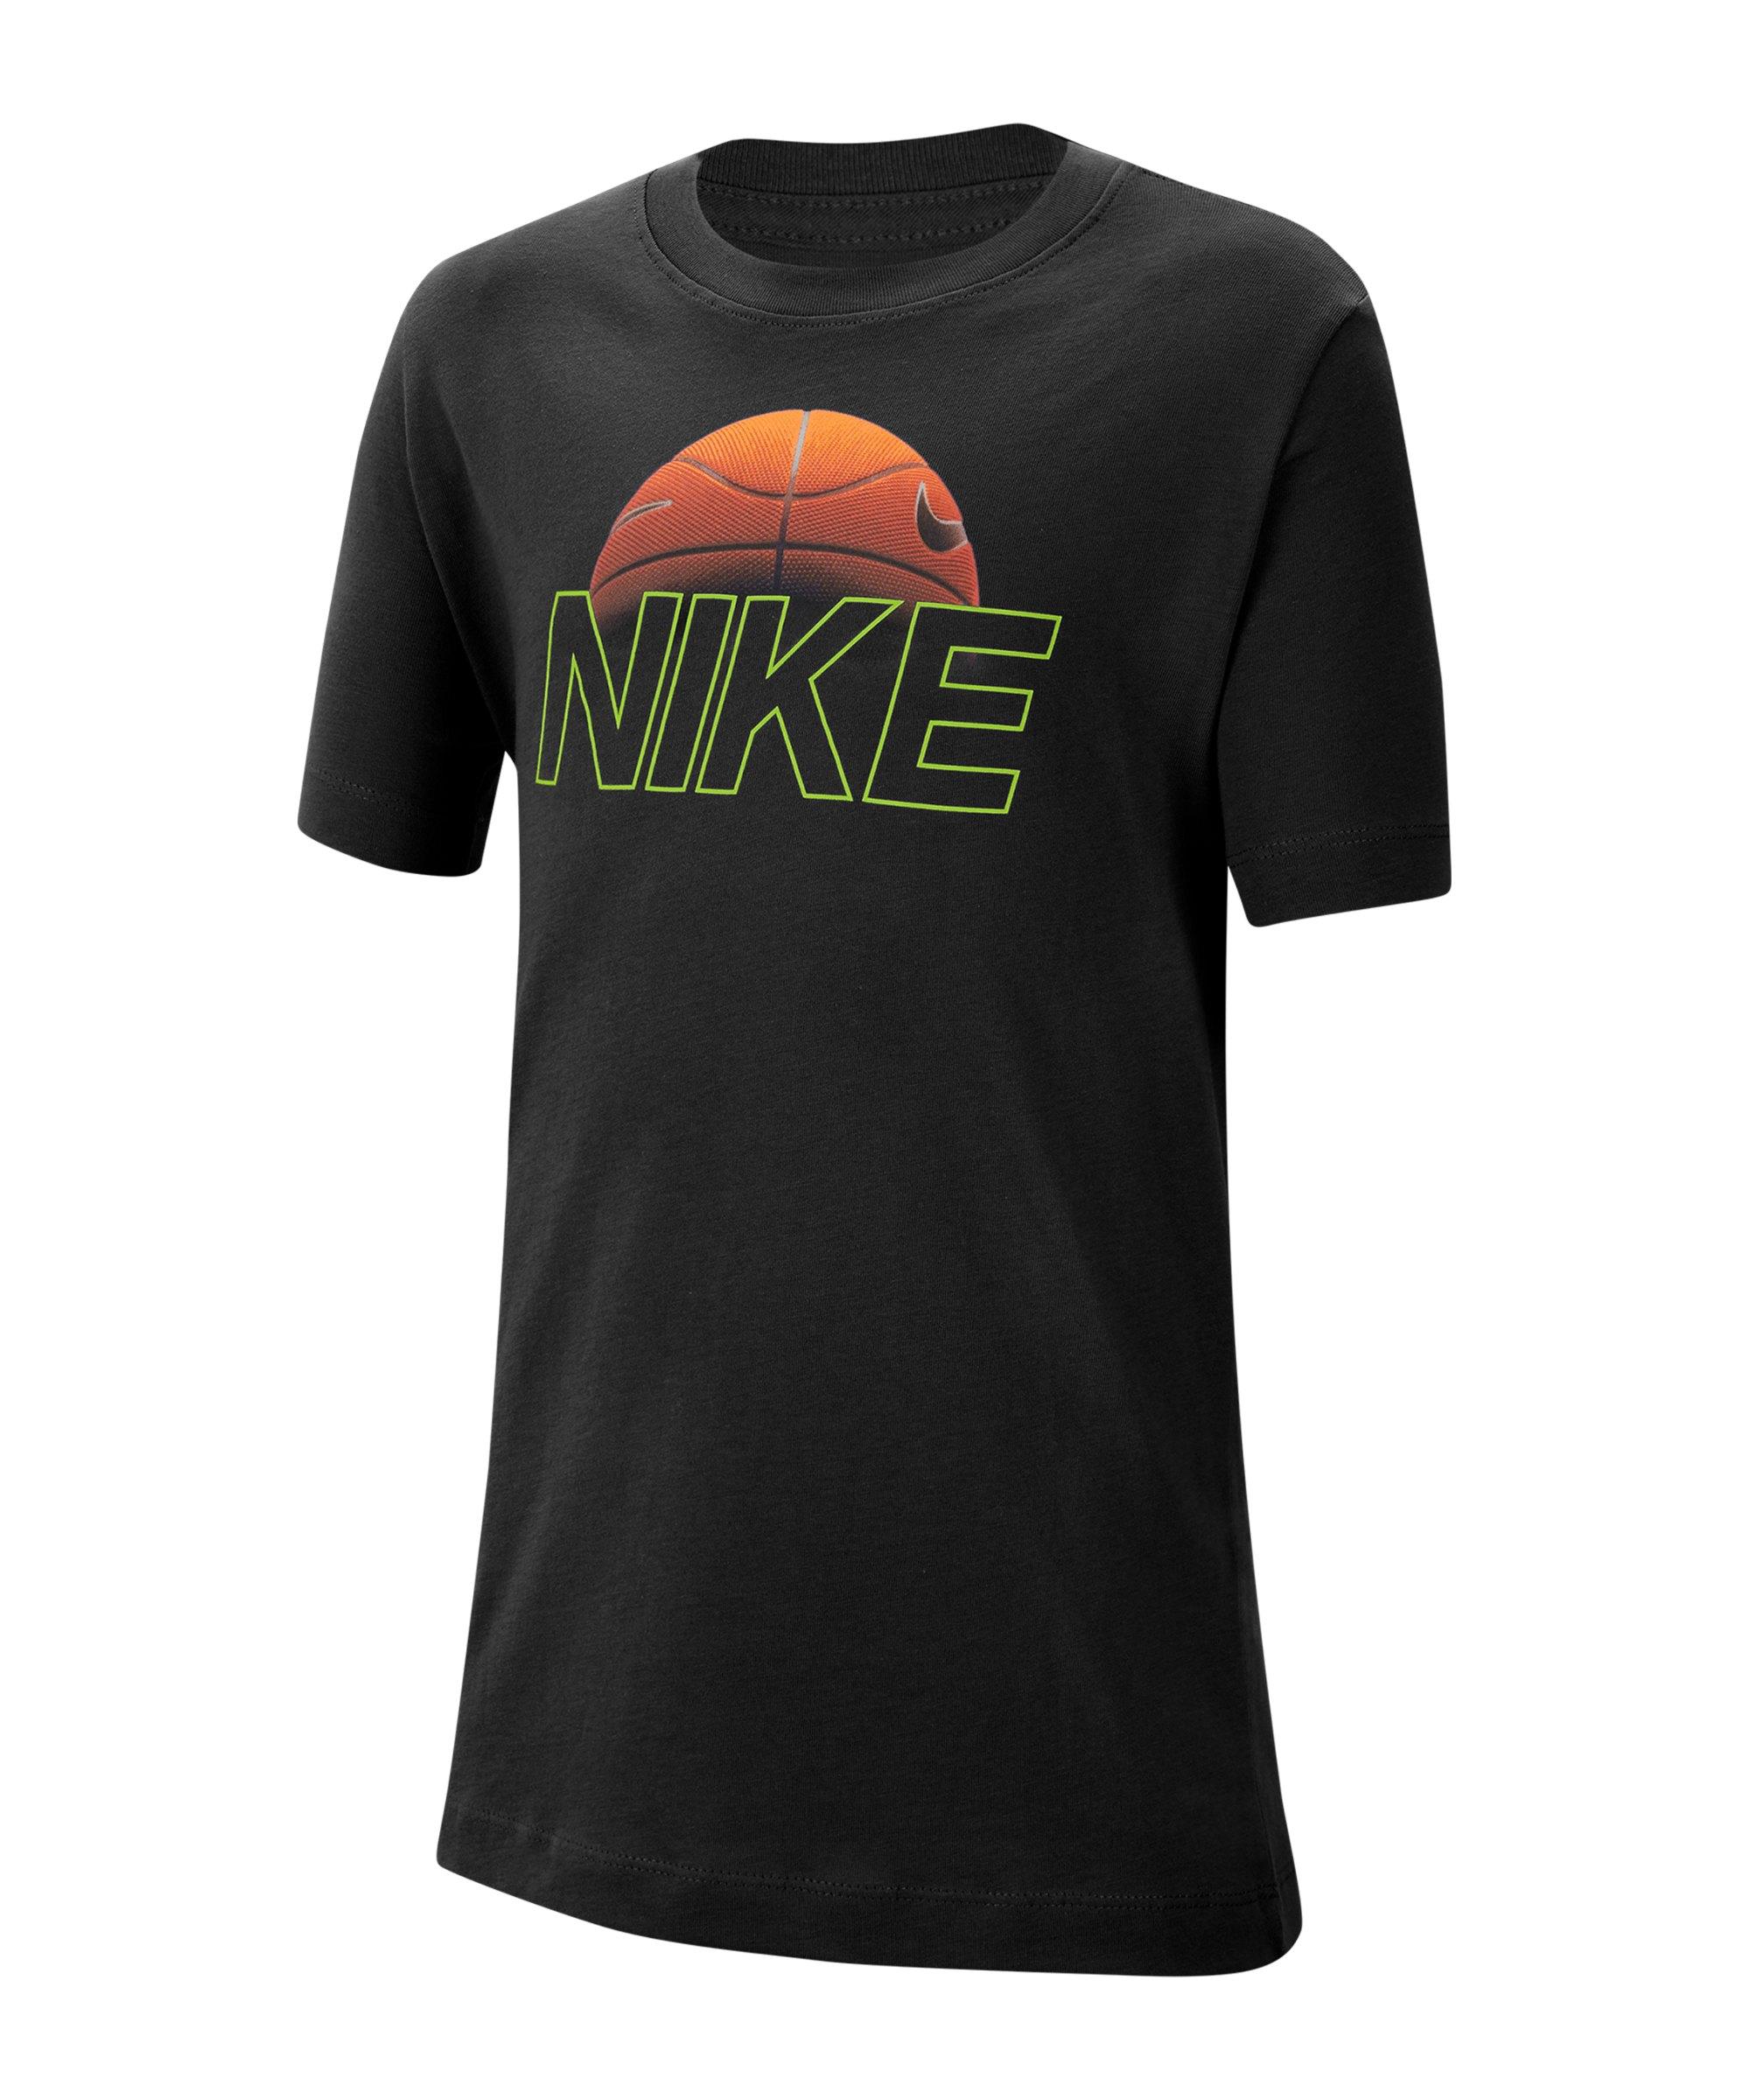 Nike Basketball T-Shirt Schwarz F010 - schwarz